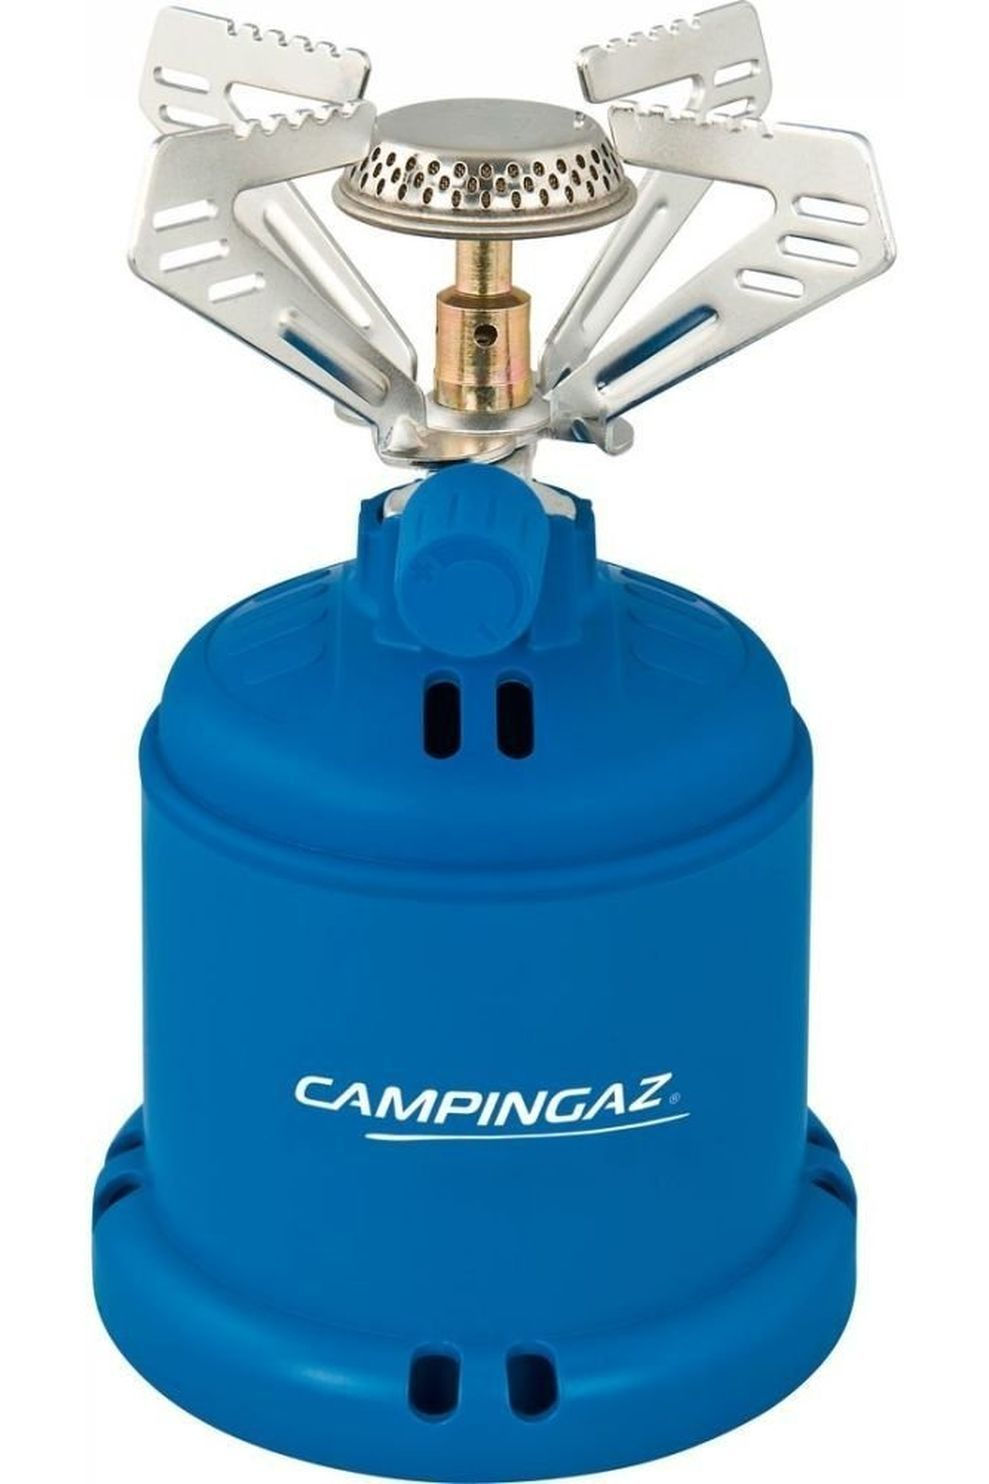 Campingaz Brander Camping 206S - - Transparant